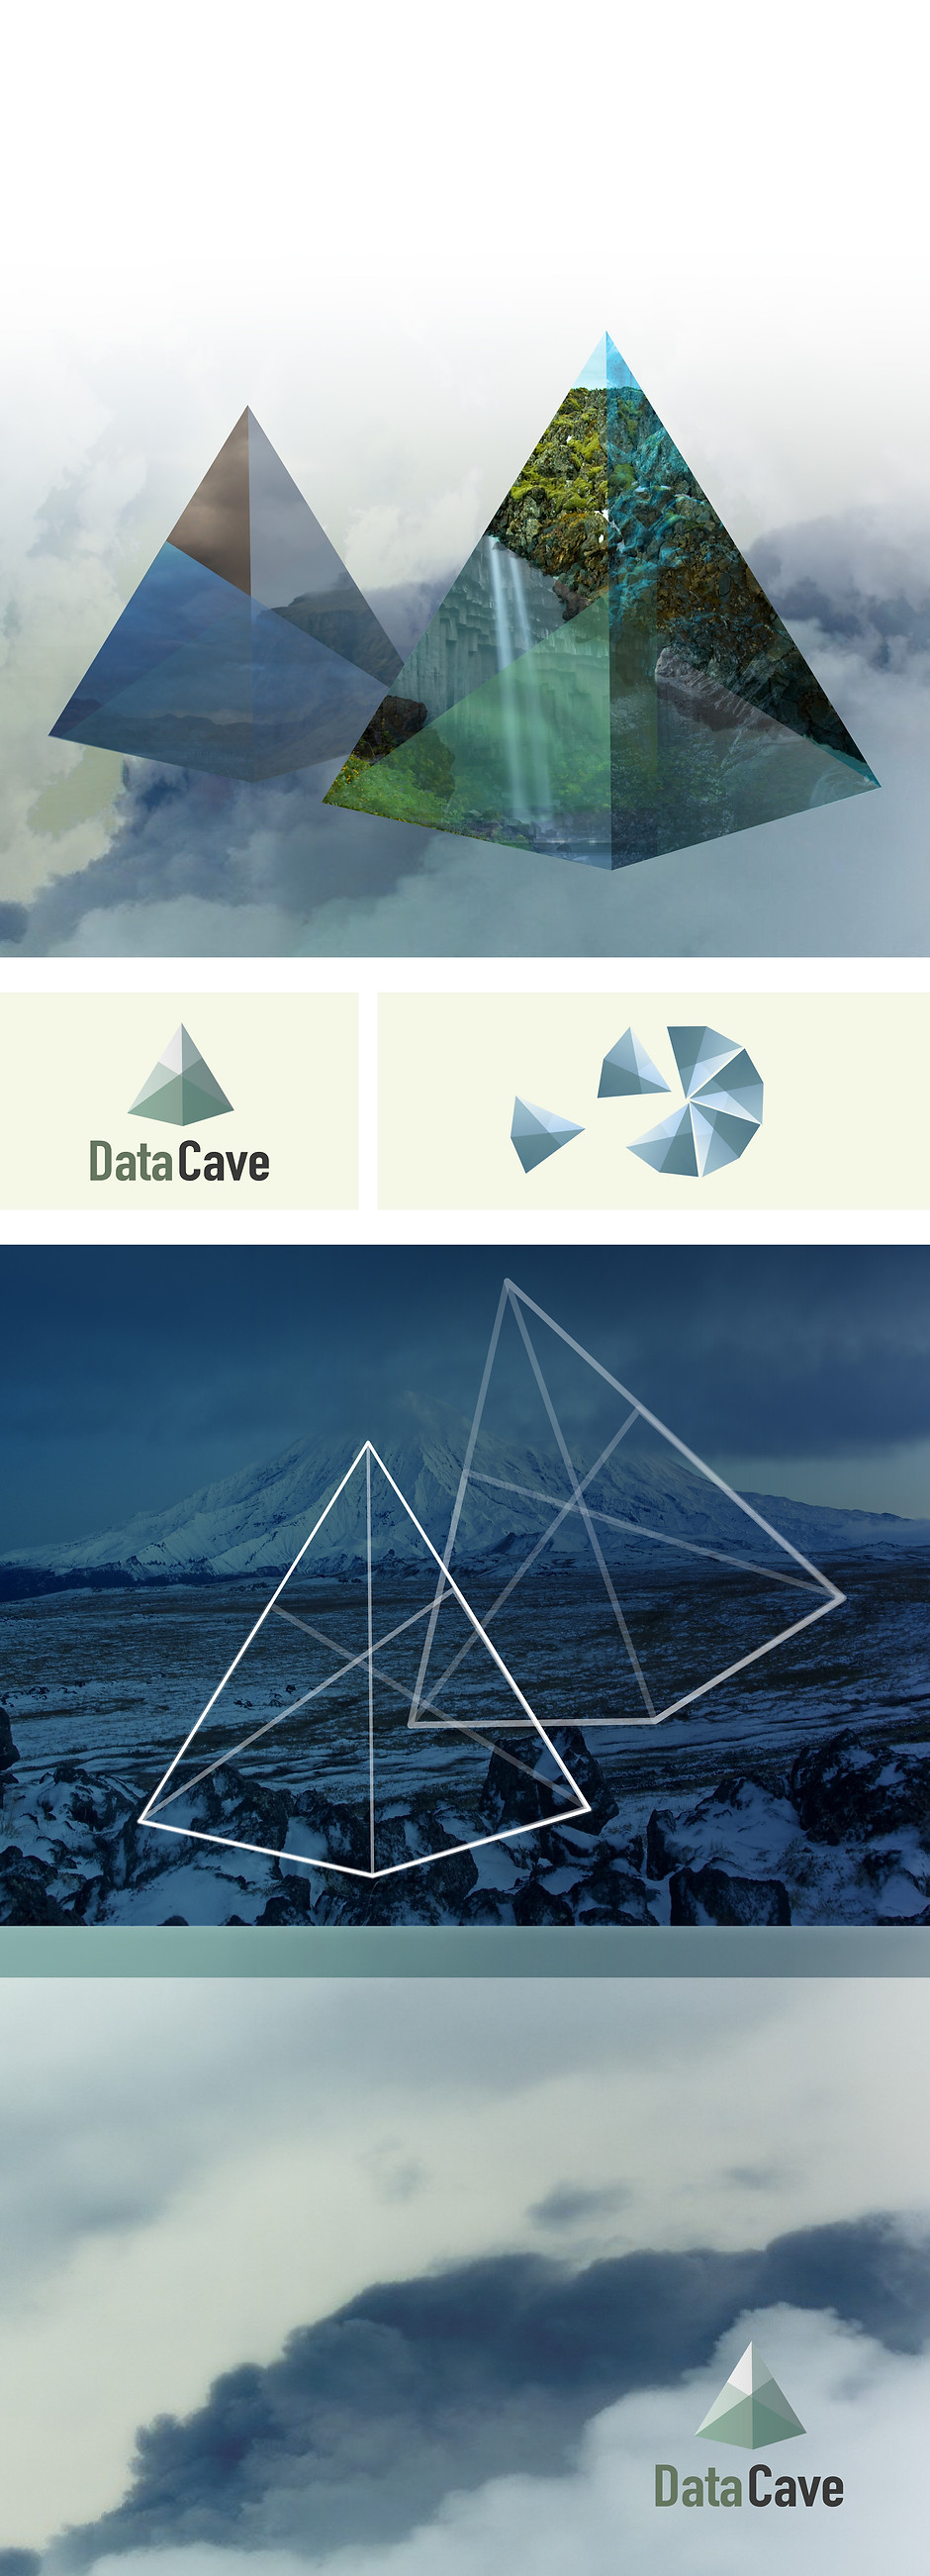 data-cave-copy789.jpg